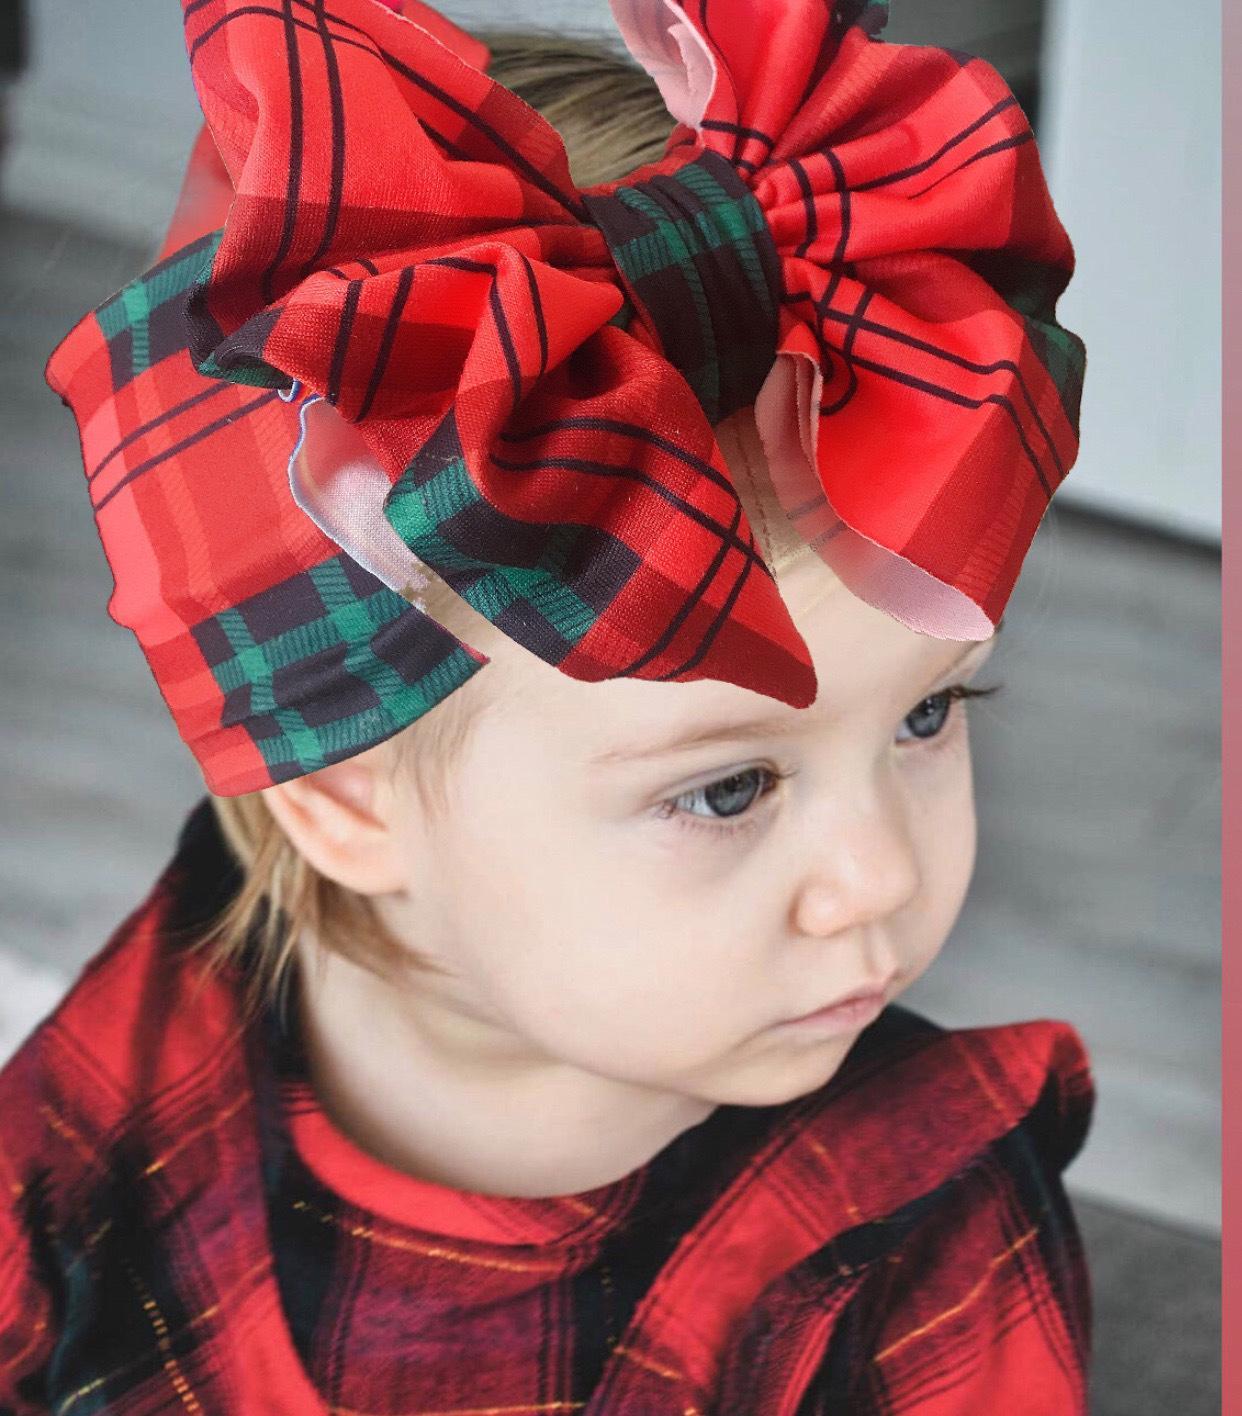 Baby Large Bow Flower Girls Headband Big Bowknot Headwrap Kids Bow for Hair Cotton Wide Head Turban Infant Newborn Headbands